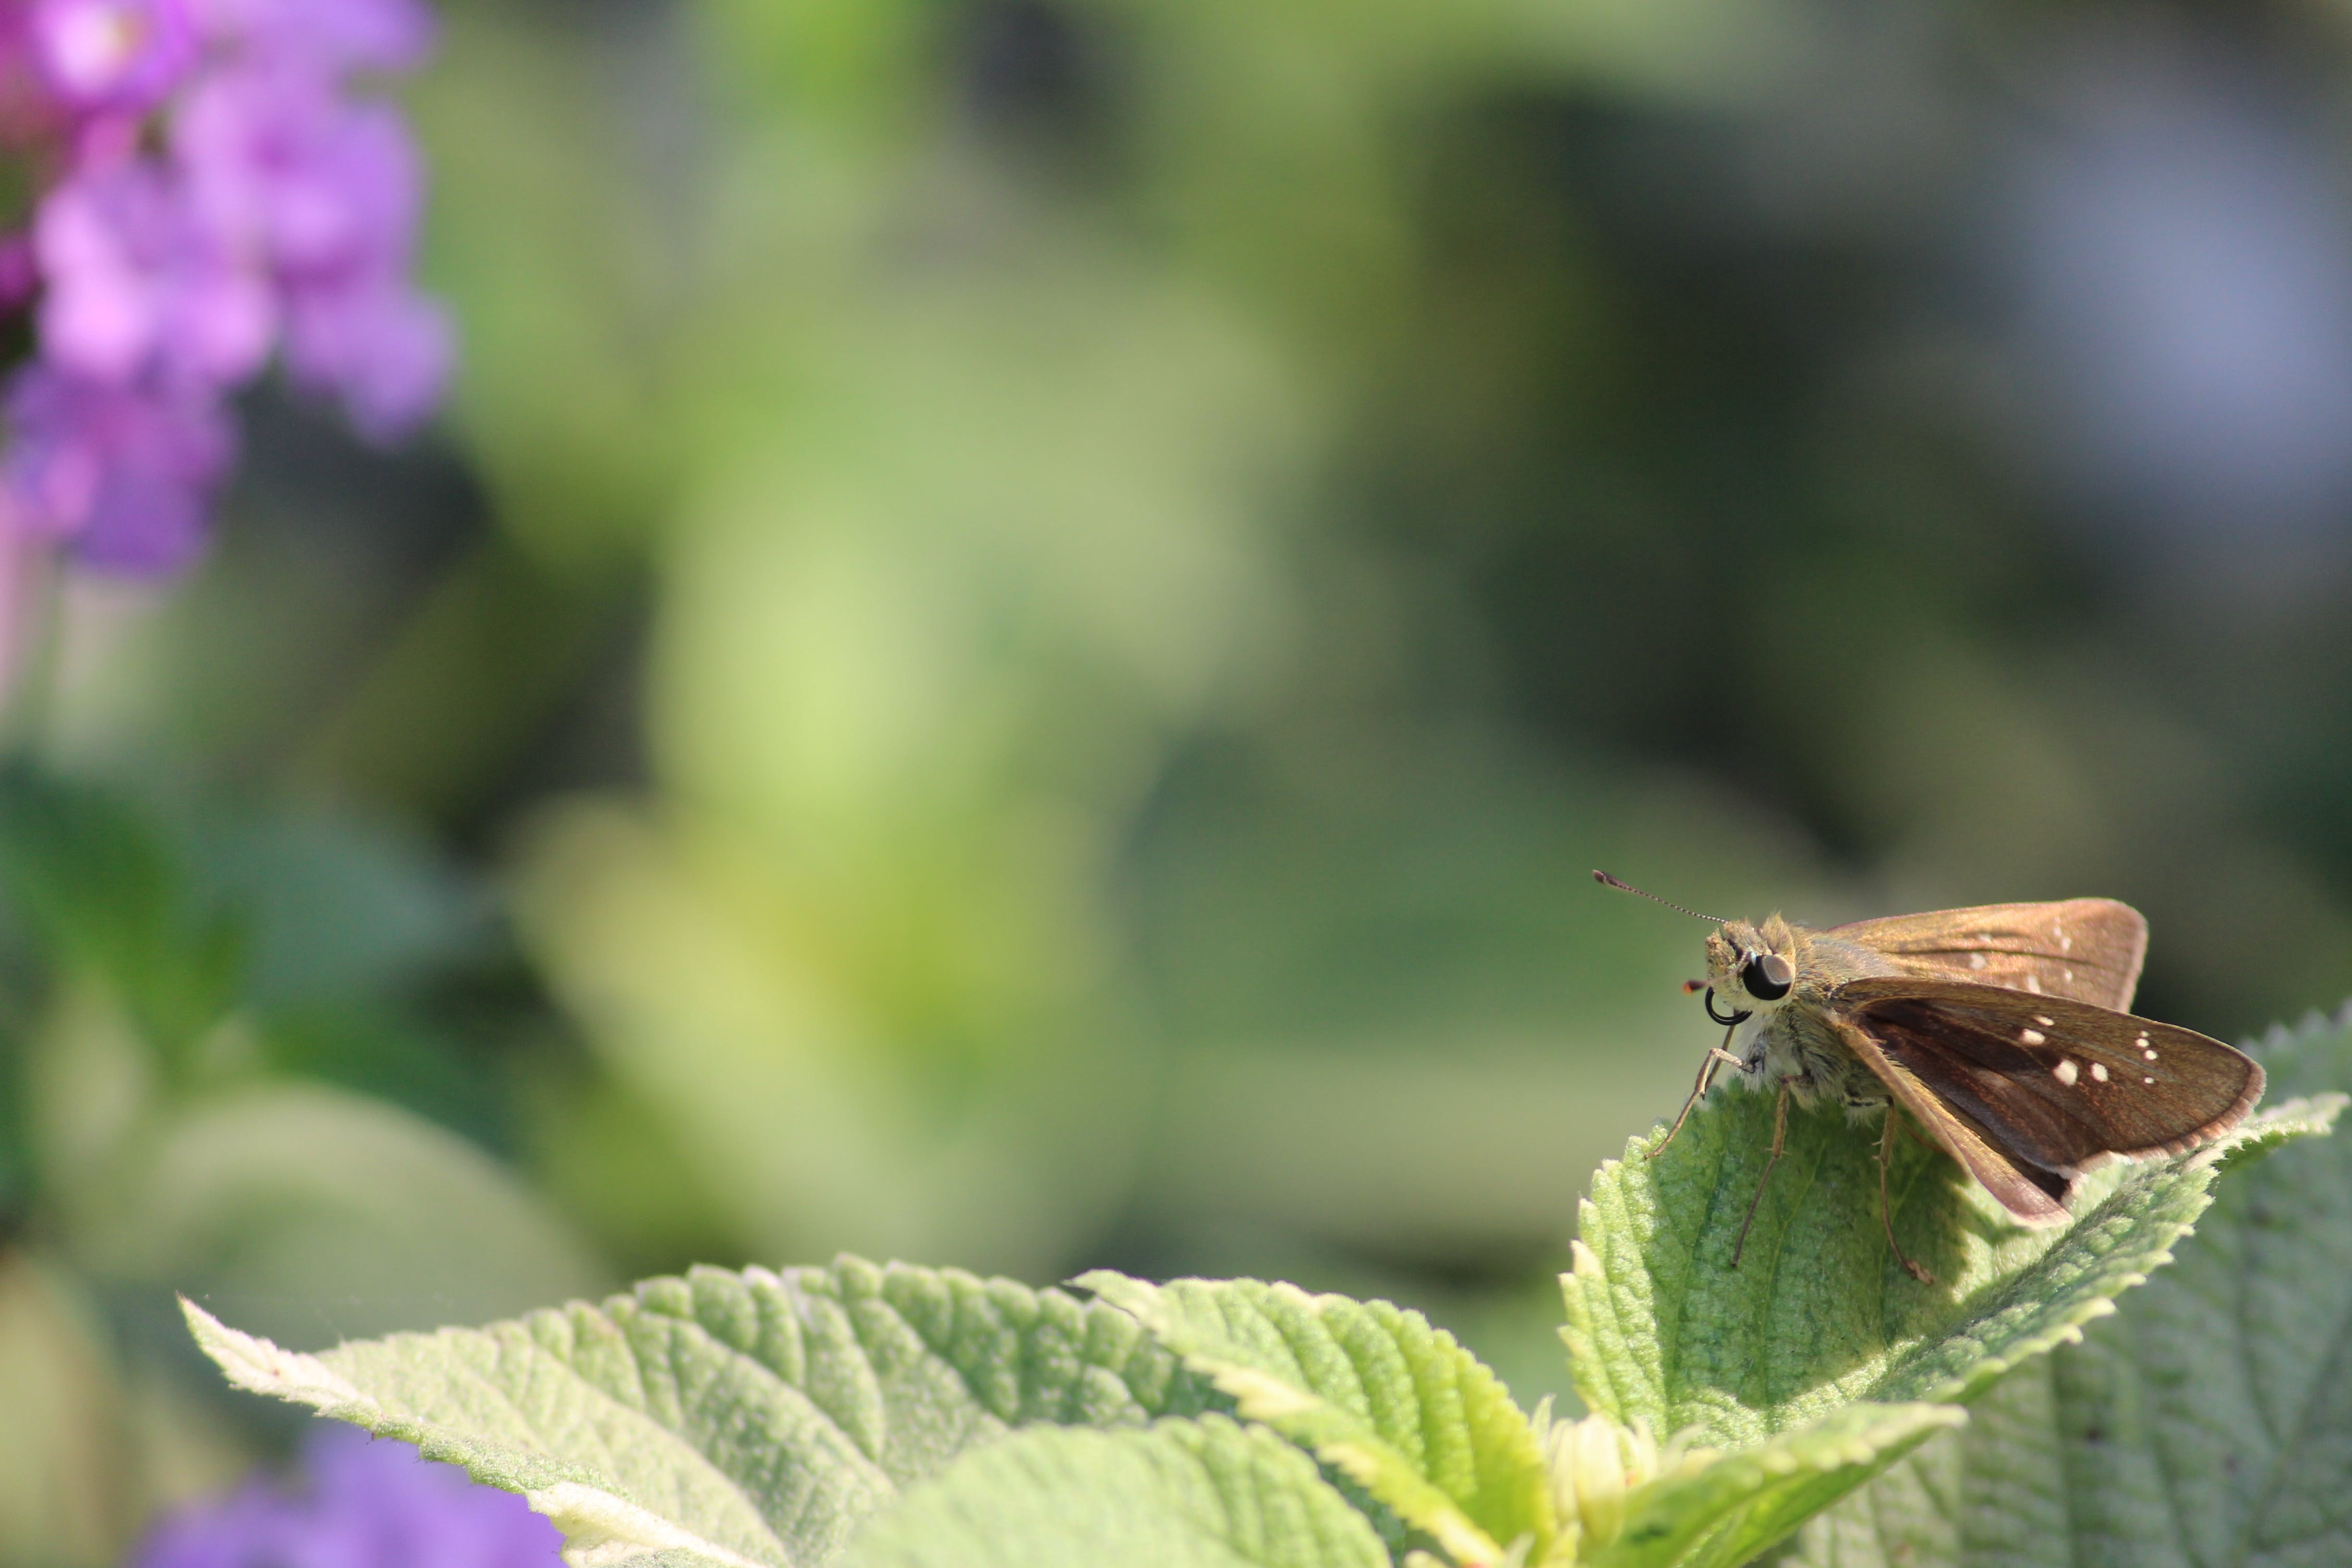 Brown Skipper Moth Perched on Green Leaf